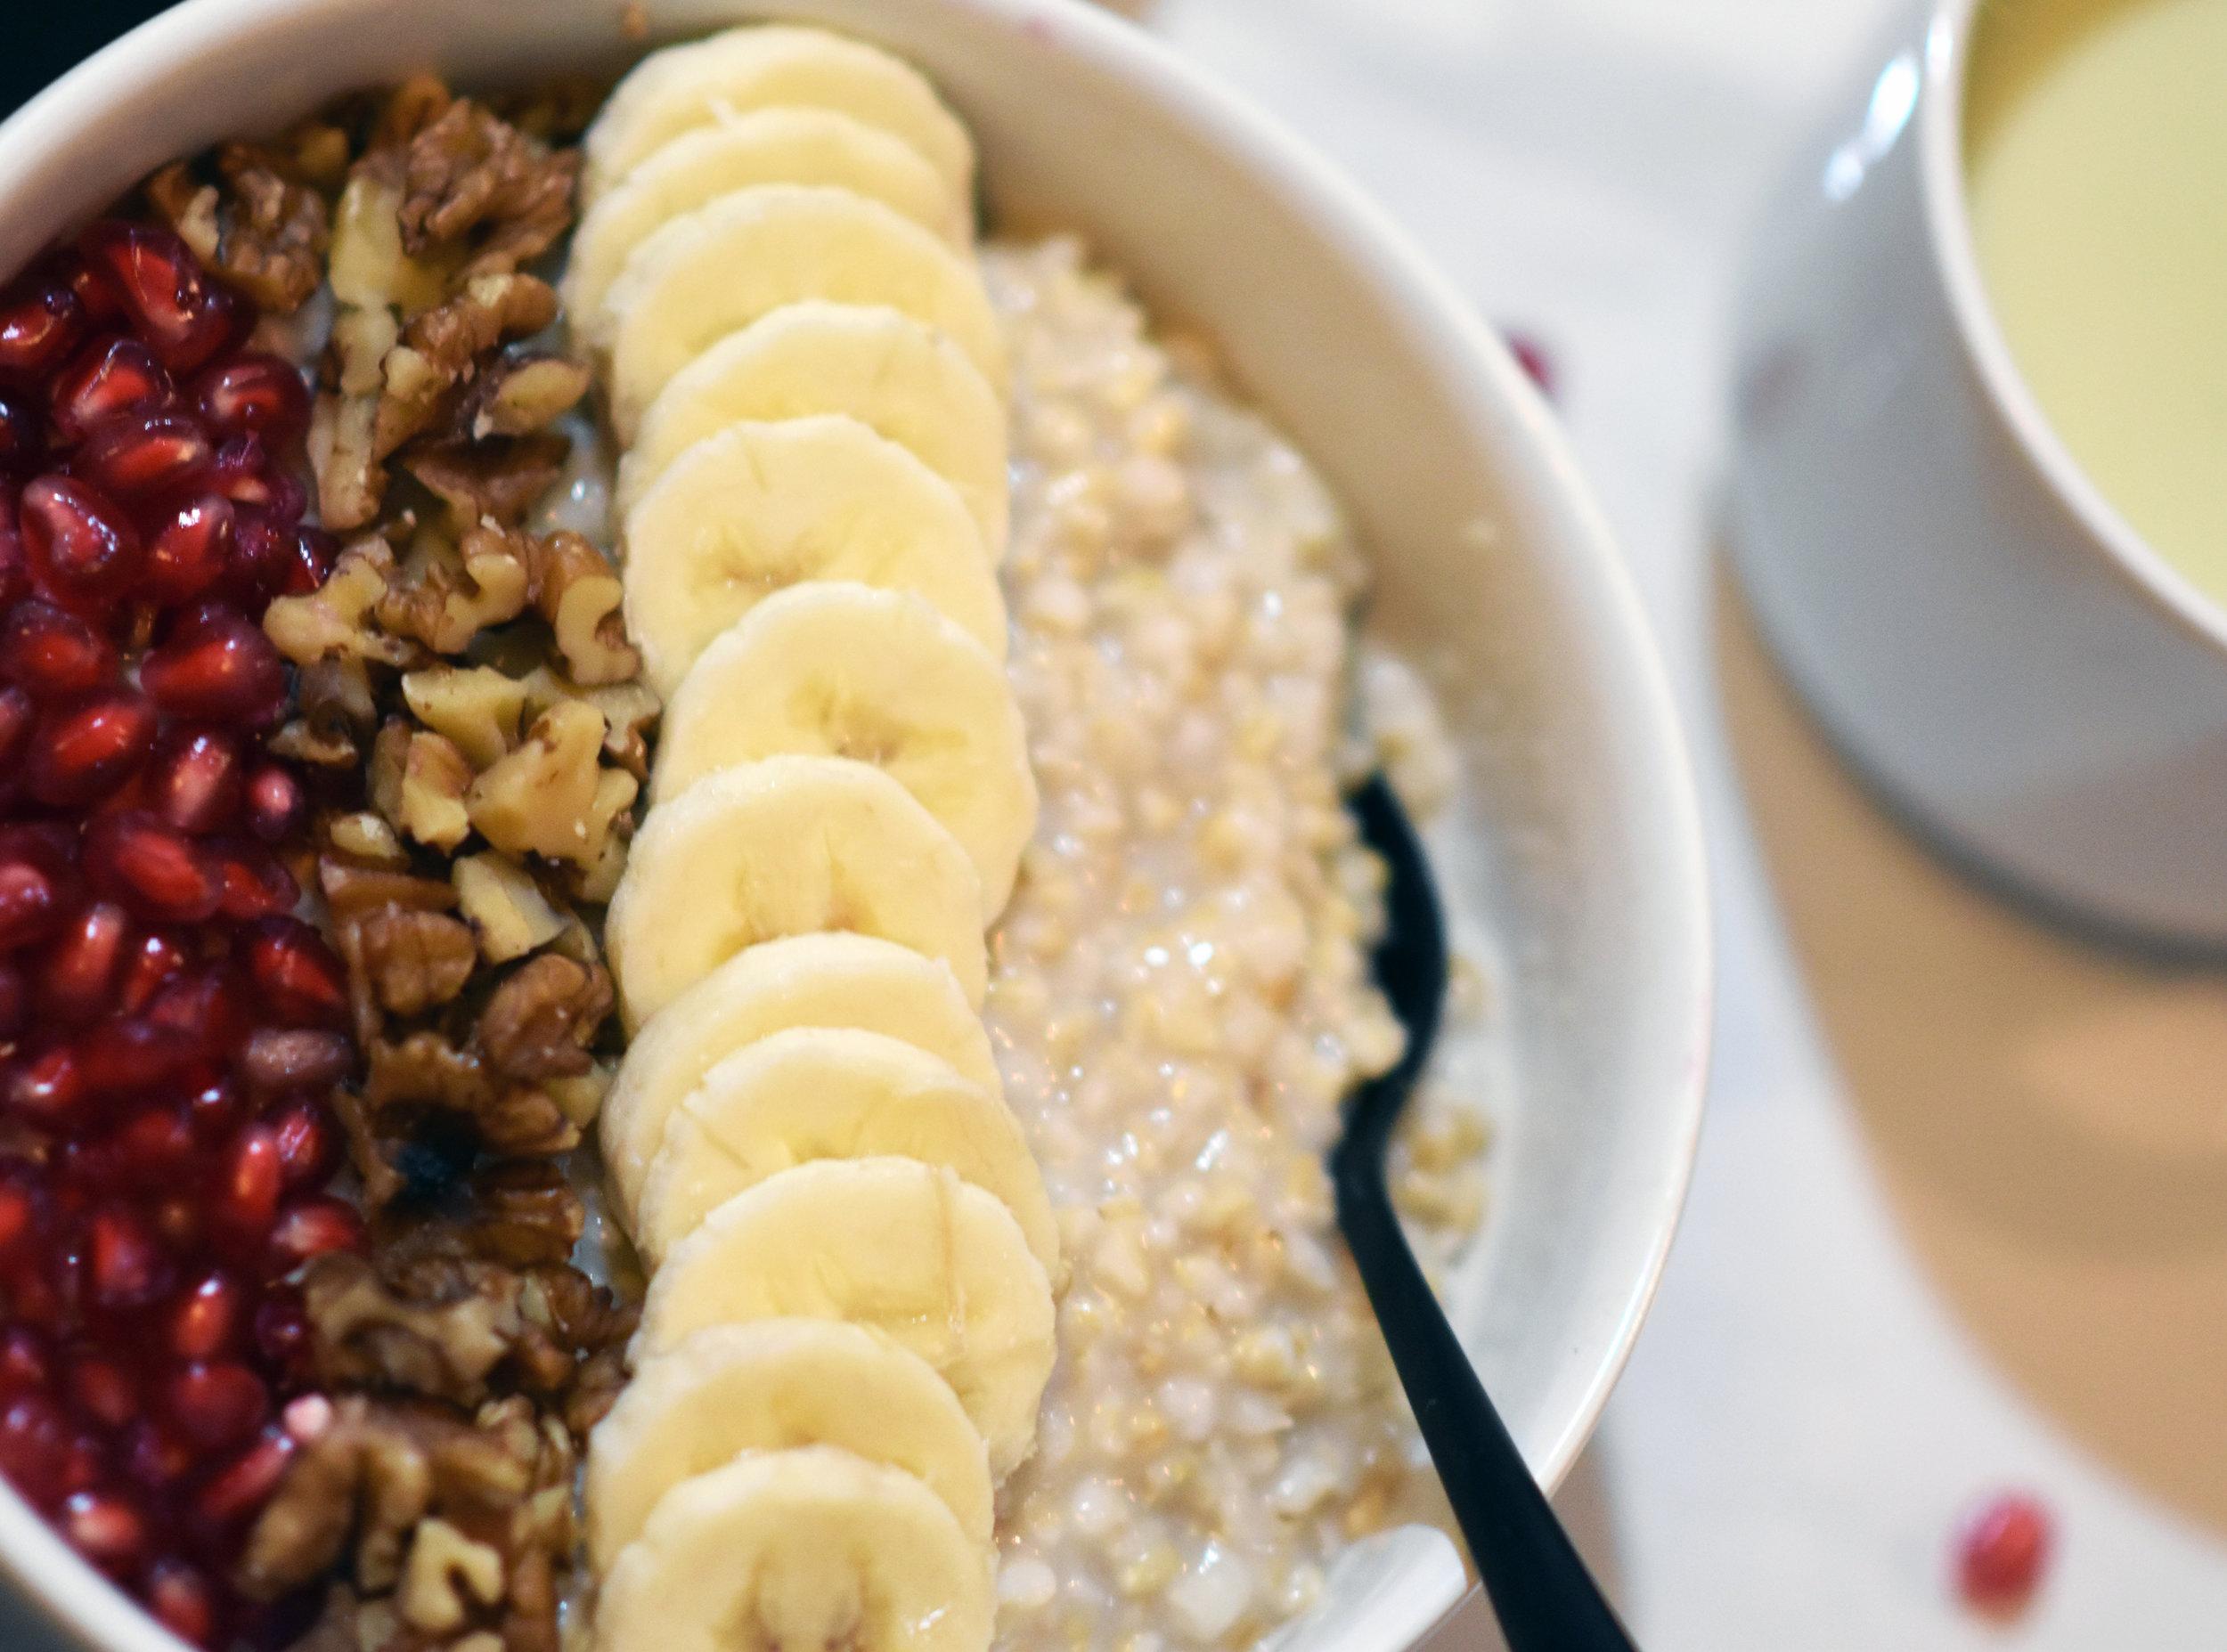 creamy InstantPot steel cut oats - the unsexiest of breakfasts, but still damn delicious